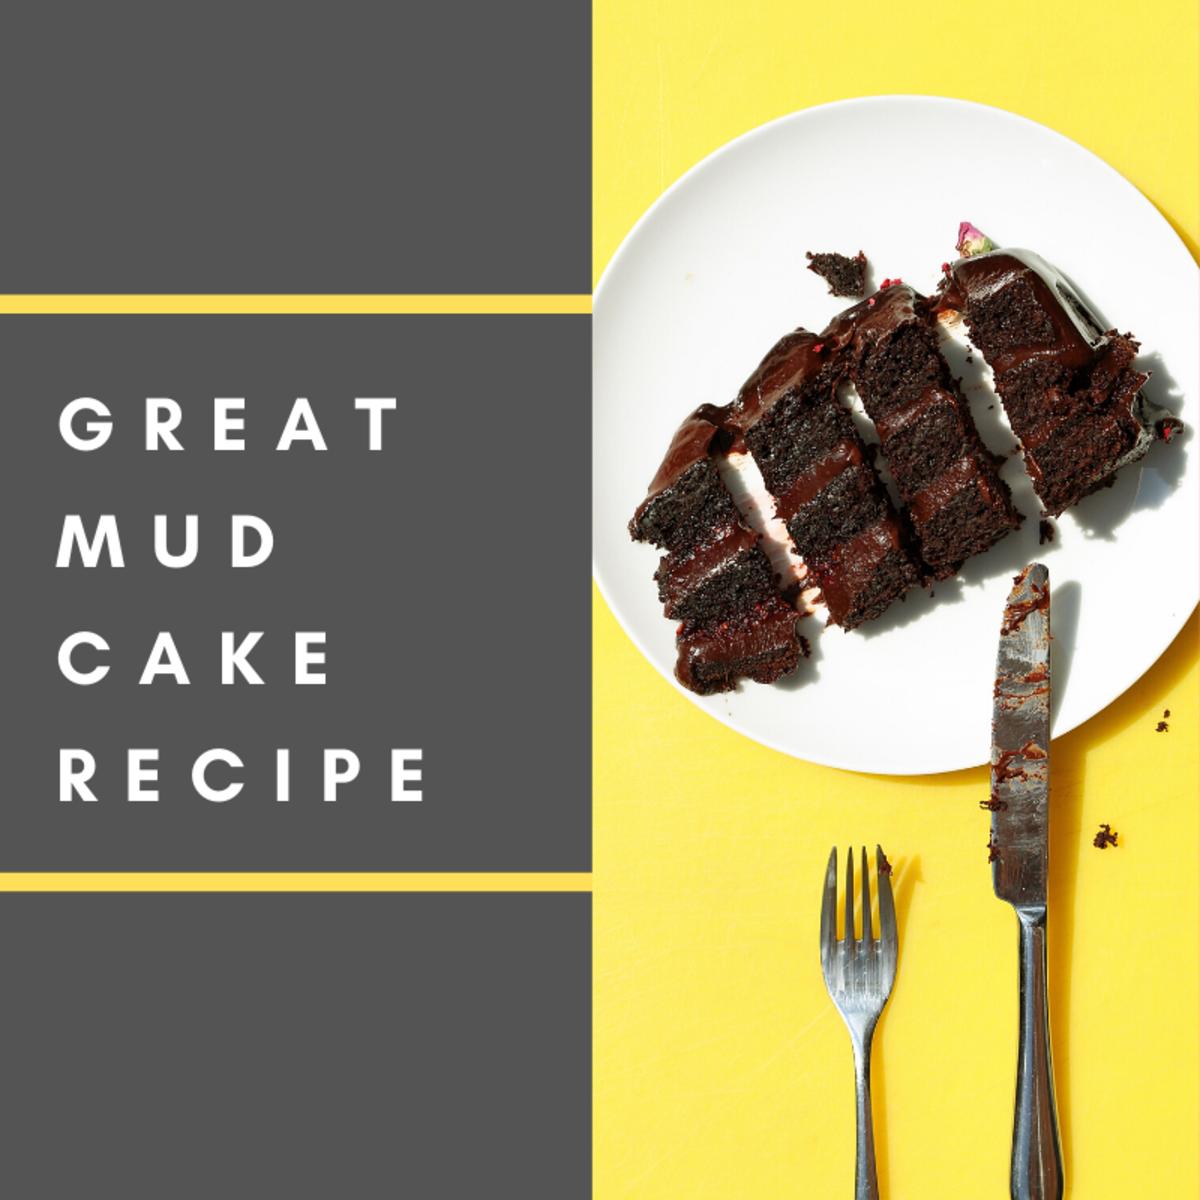 Best-Ever Mud Cake Recipe